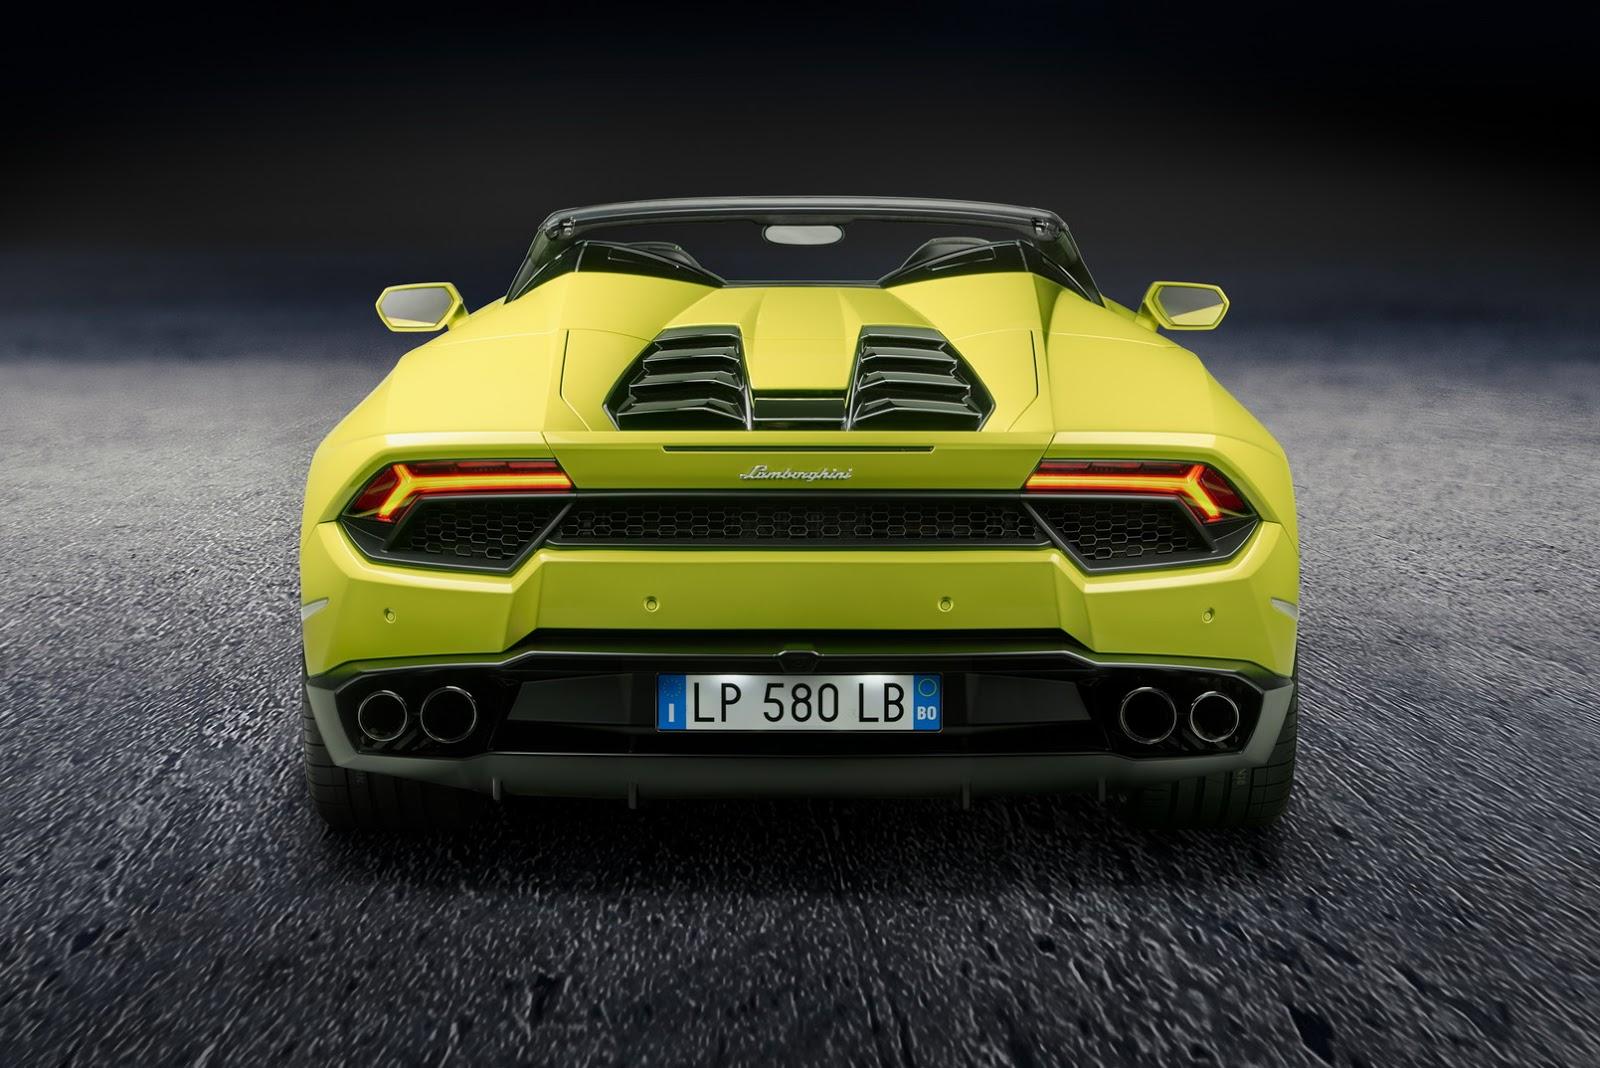 2017 Lamborghini Huracán Spyder RWD